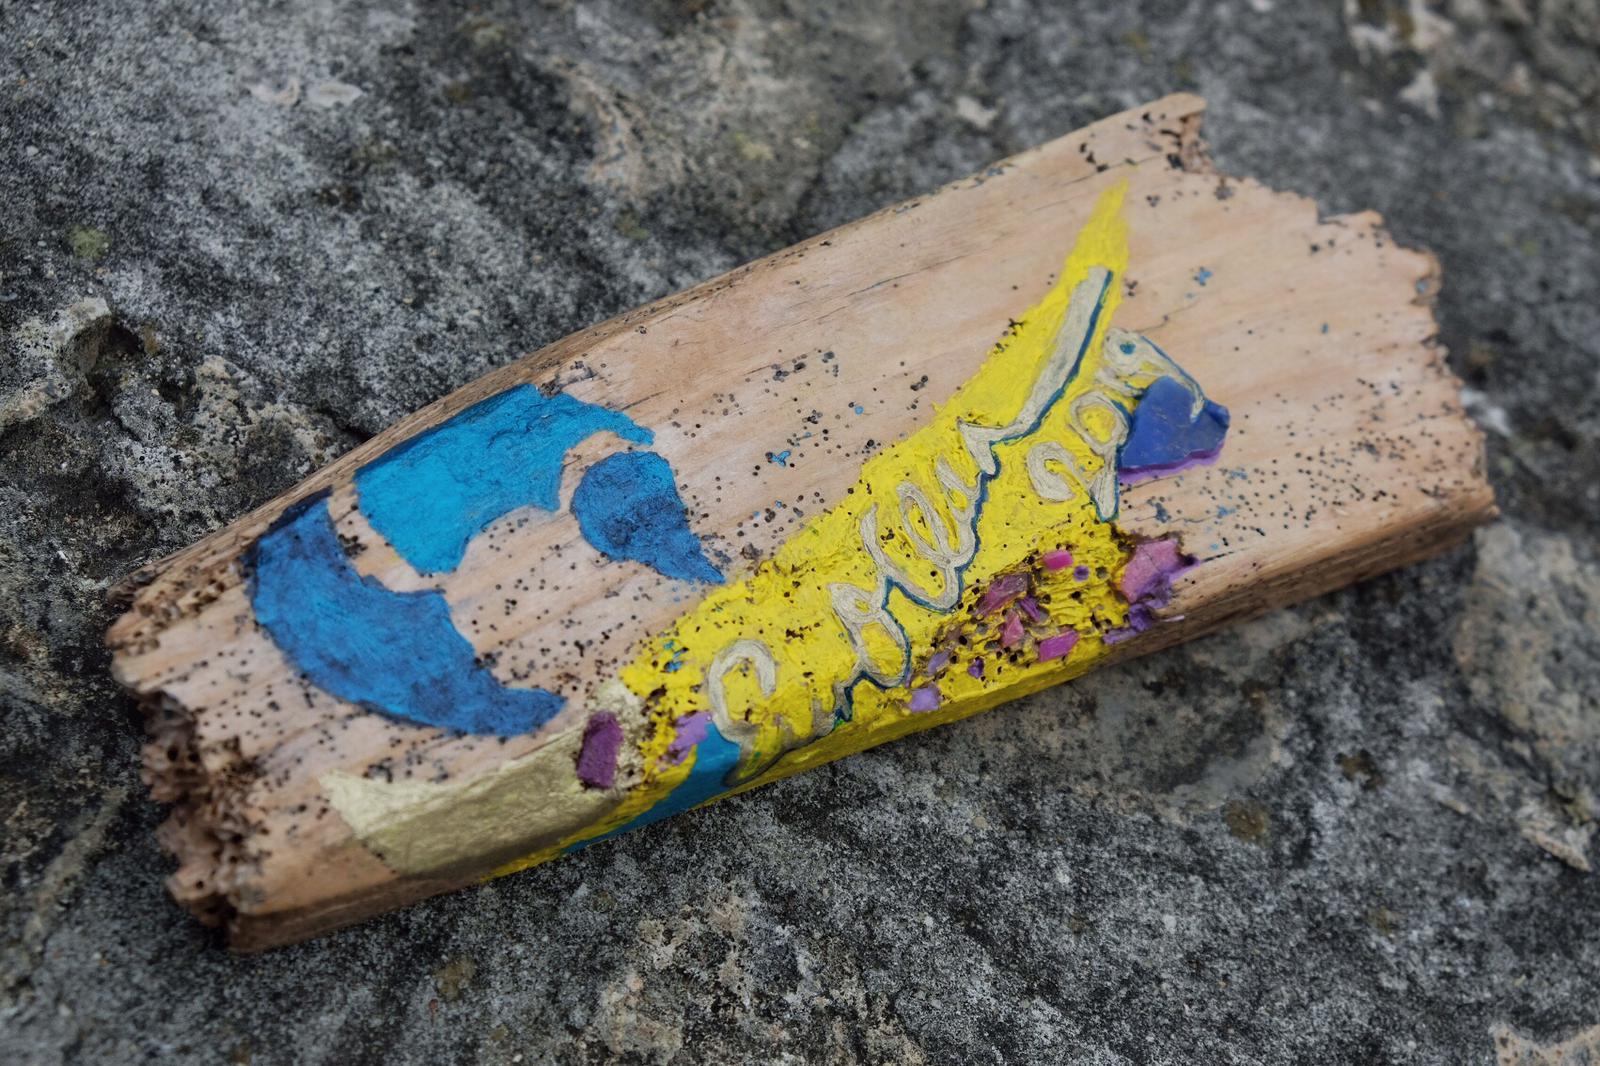 Coast-EurOCEAN2019, Mixed Media and Thames Plastic on Italian Drift Wood, 20x3x2cm (approx).